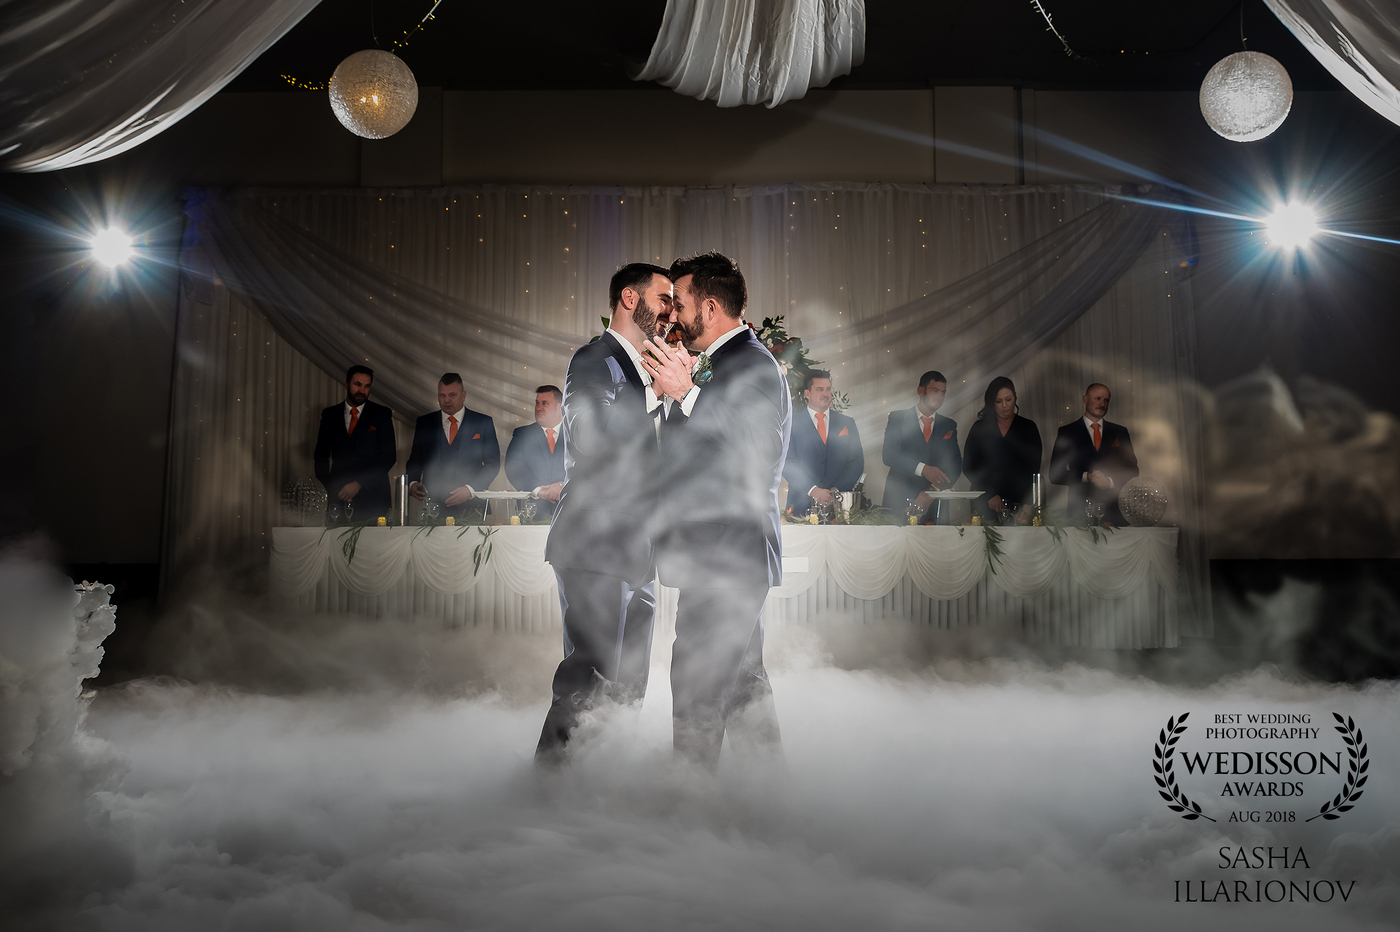 adelaide wedding photography award 02.jpg